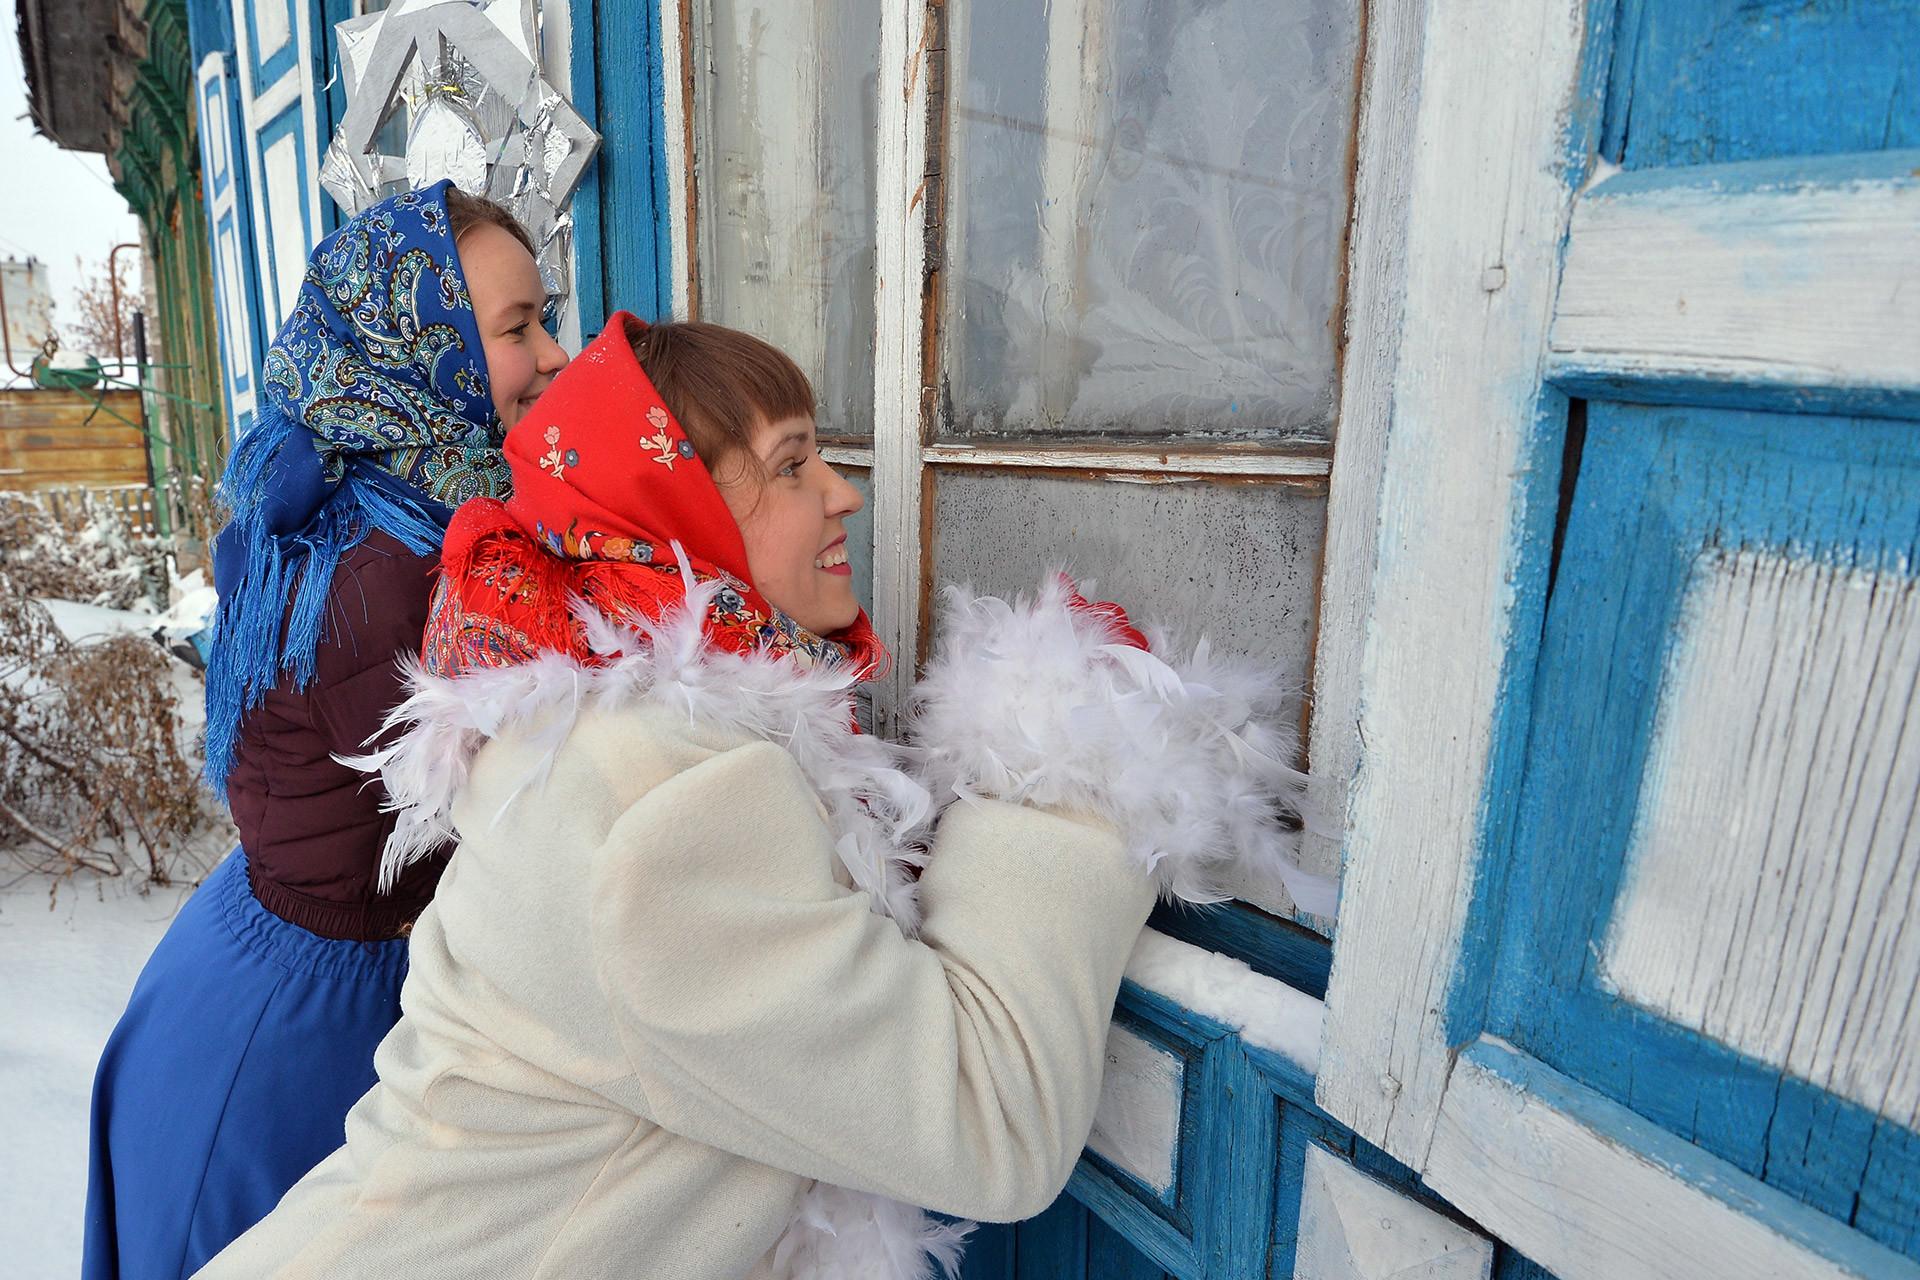 Фото ©РИА Новости/Александр Кондратюк